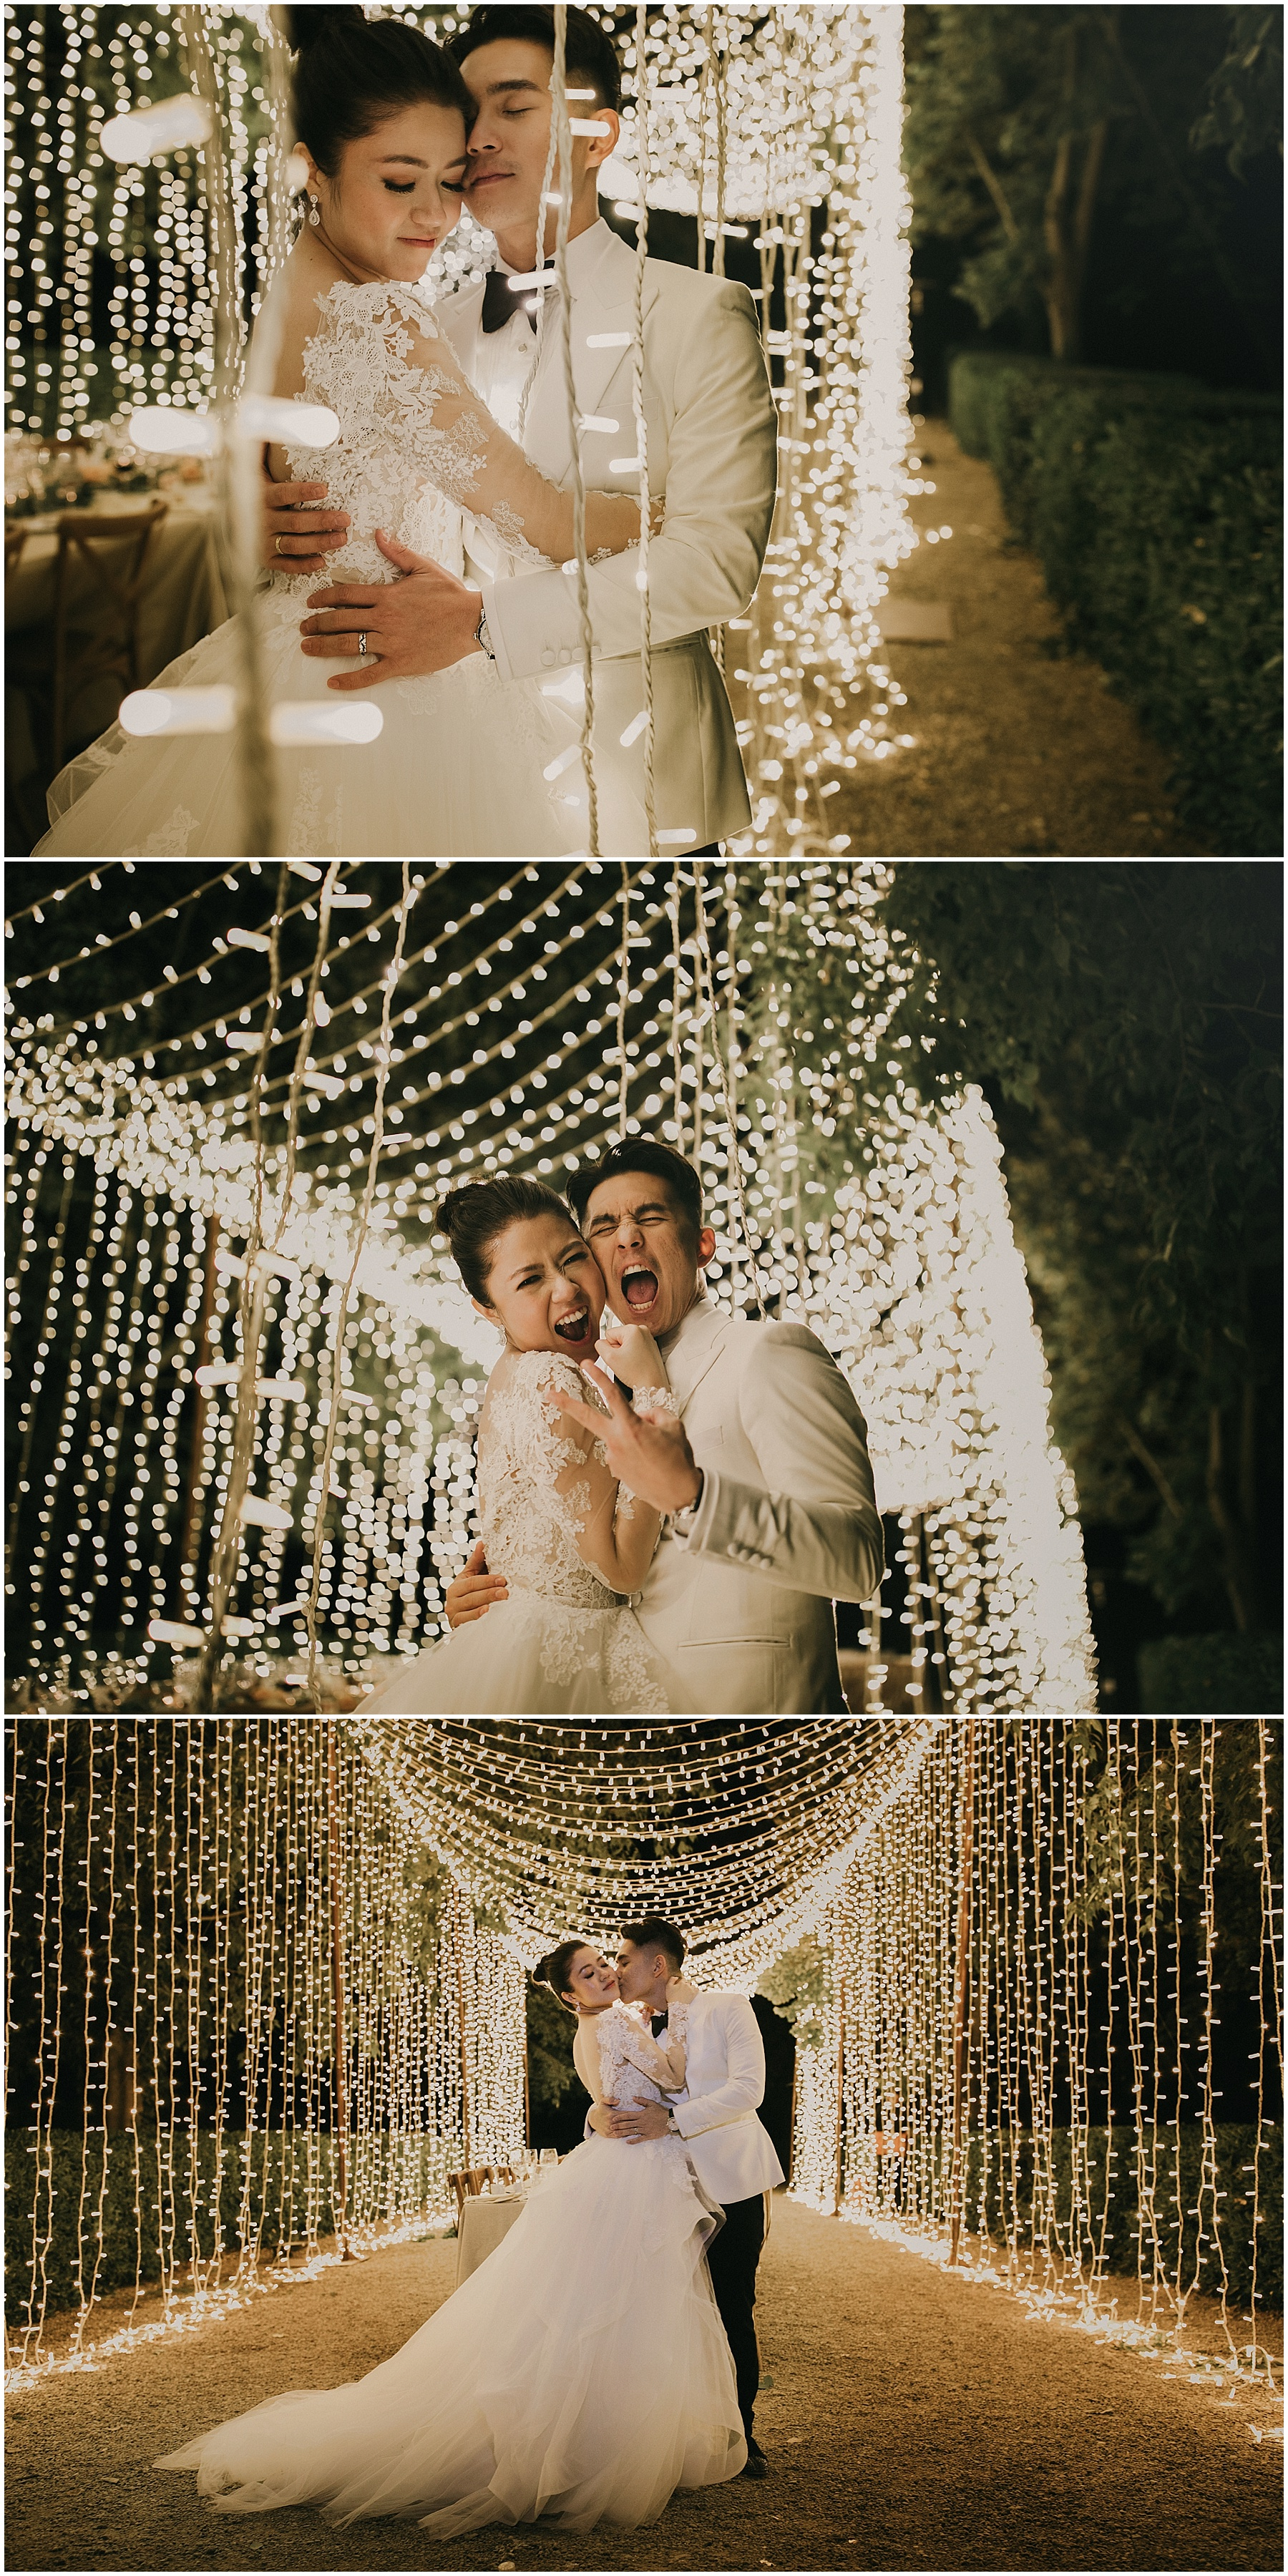 Malaysia wedding 024.JPG